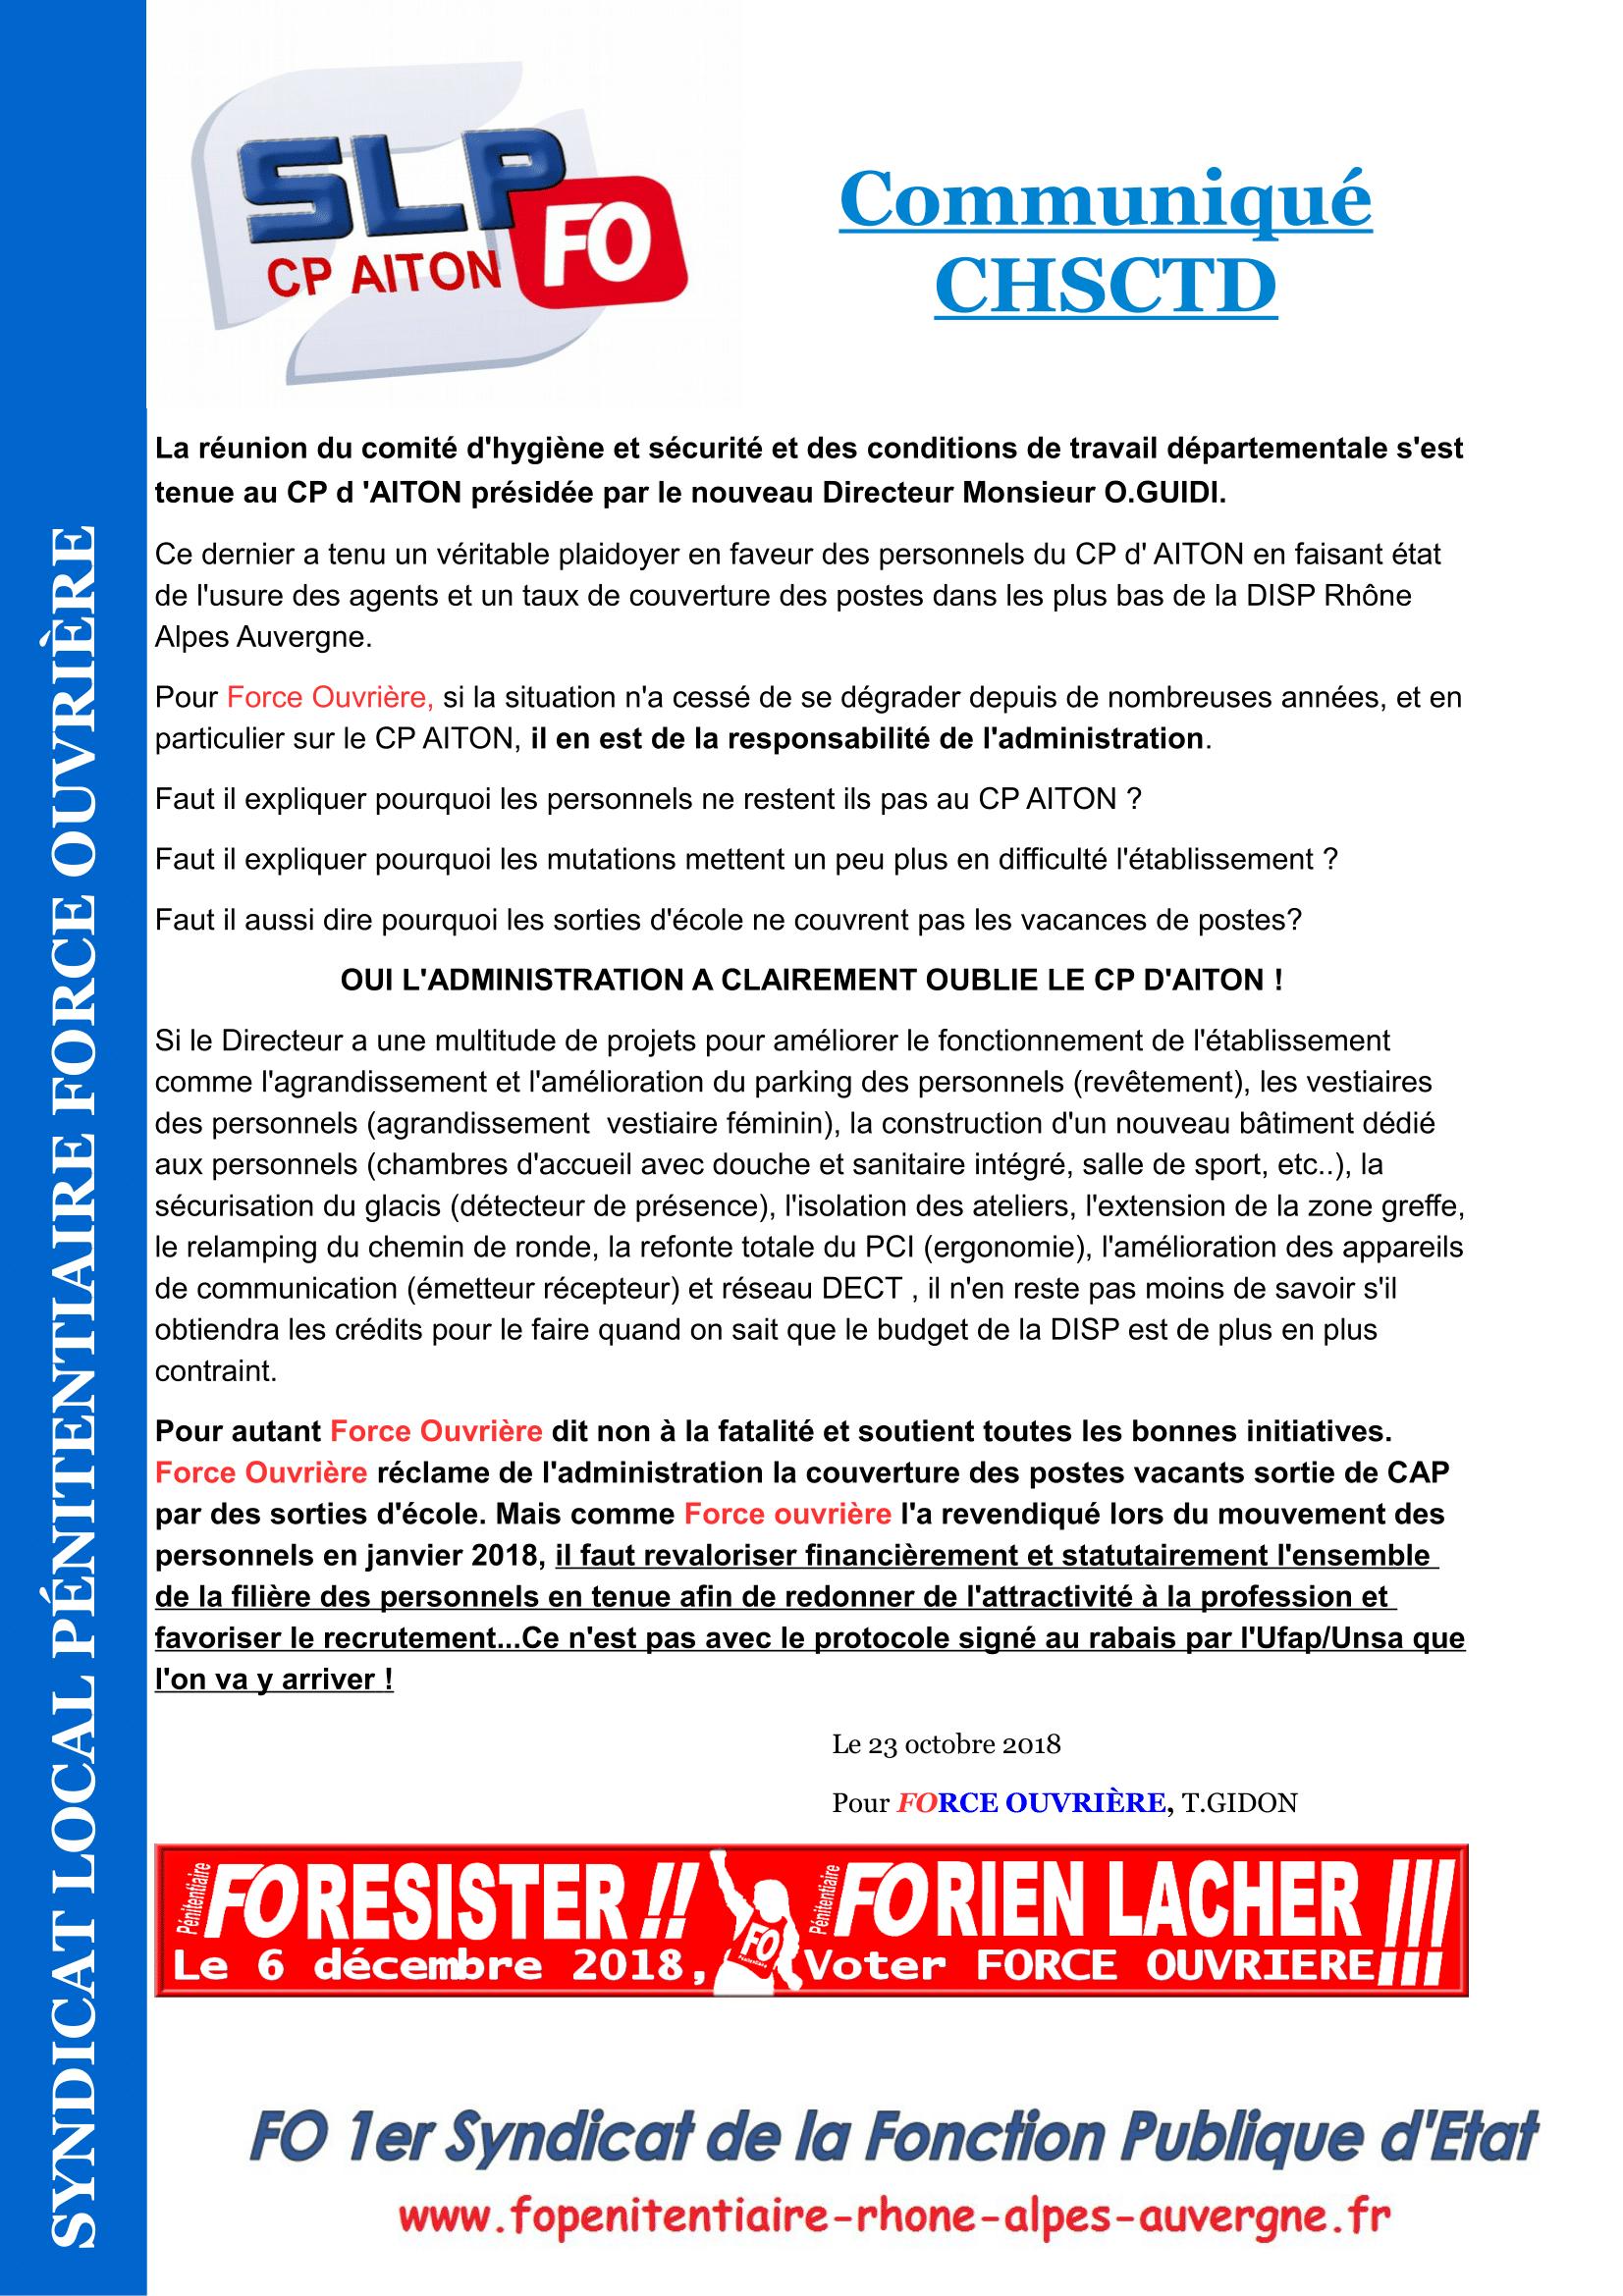 communiqué FO cp Aiton 23 octobre 2018-1